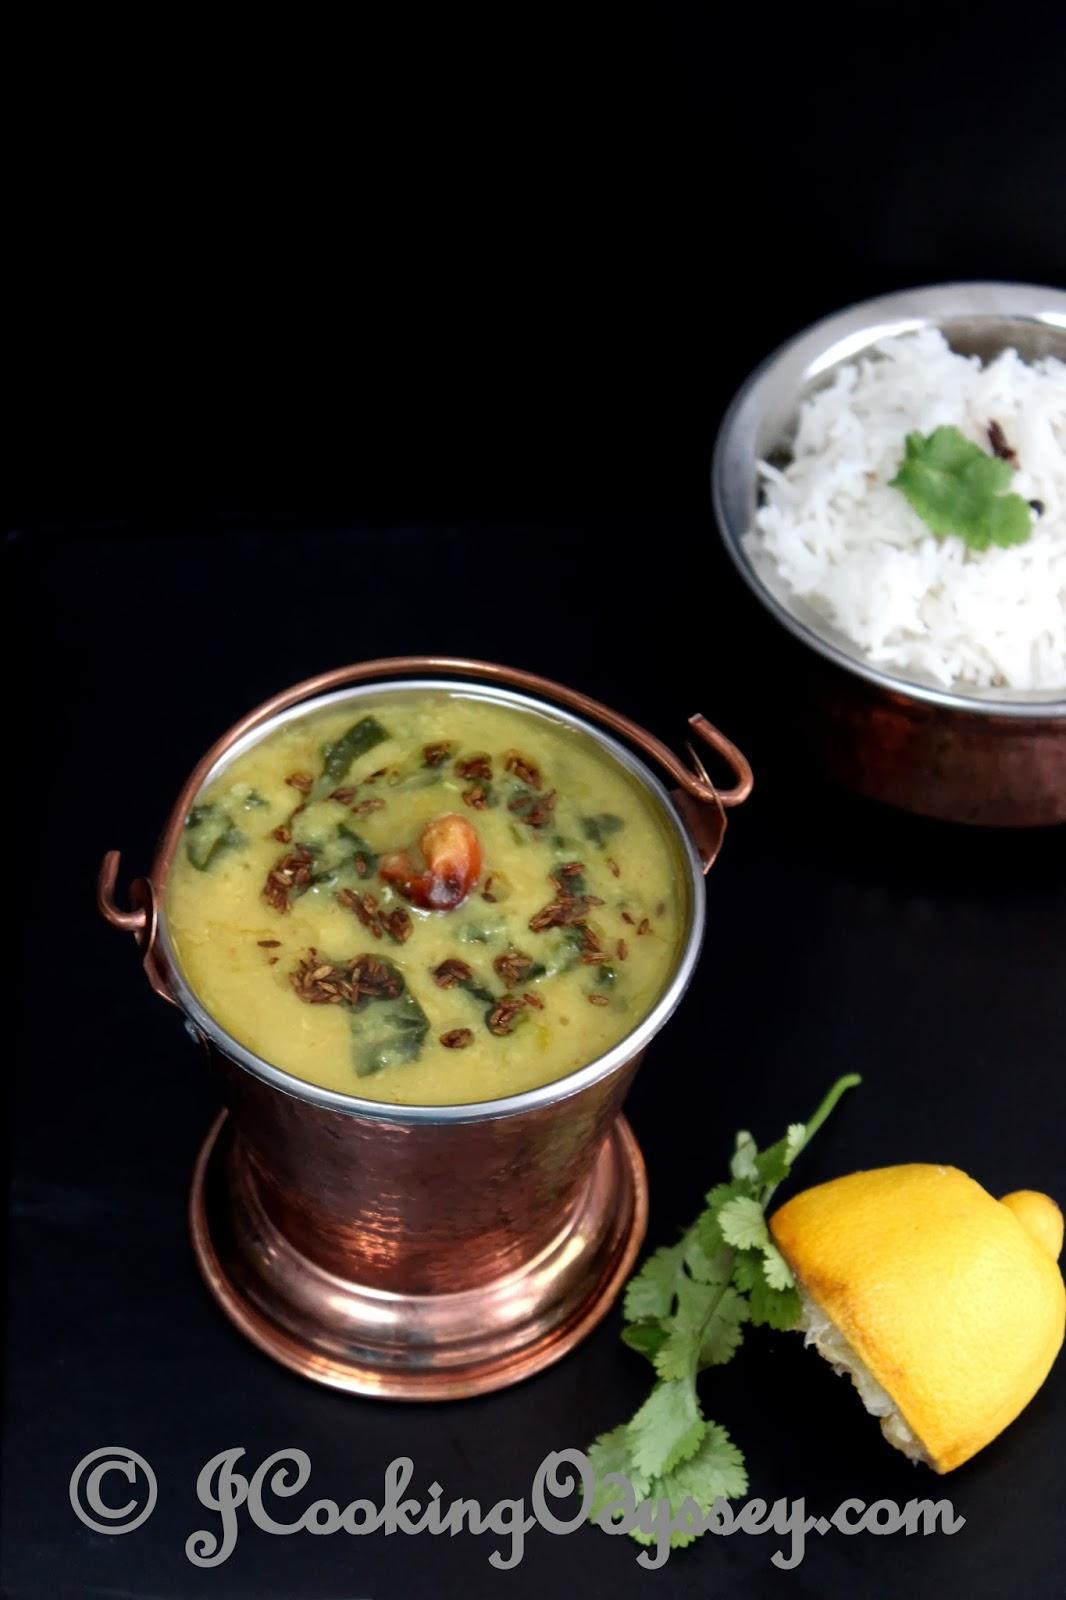 Jagruti's Cooking Odyssey: Adraki Masoor aur palak Daal - Ginger, Red ...